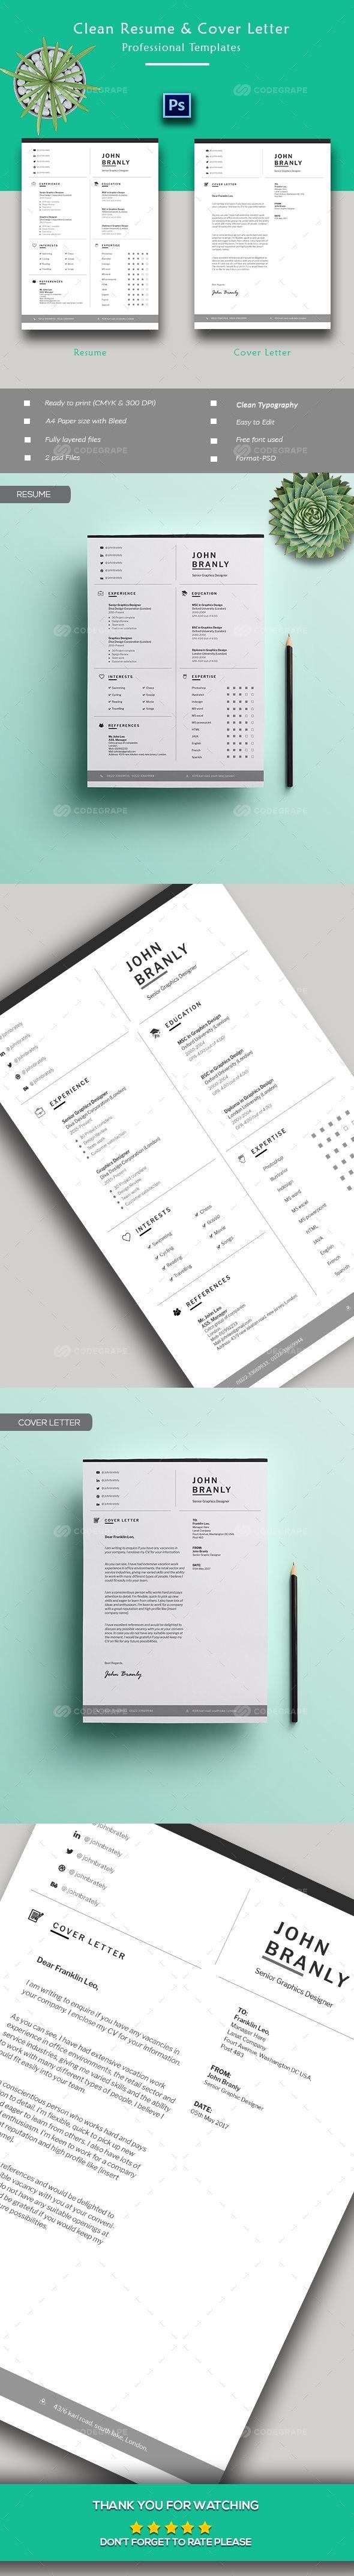 Create Online Resume Website